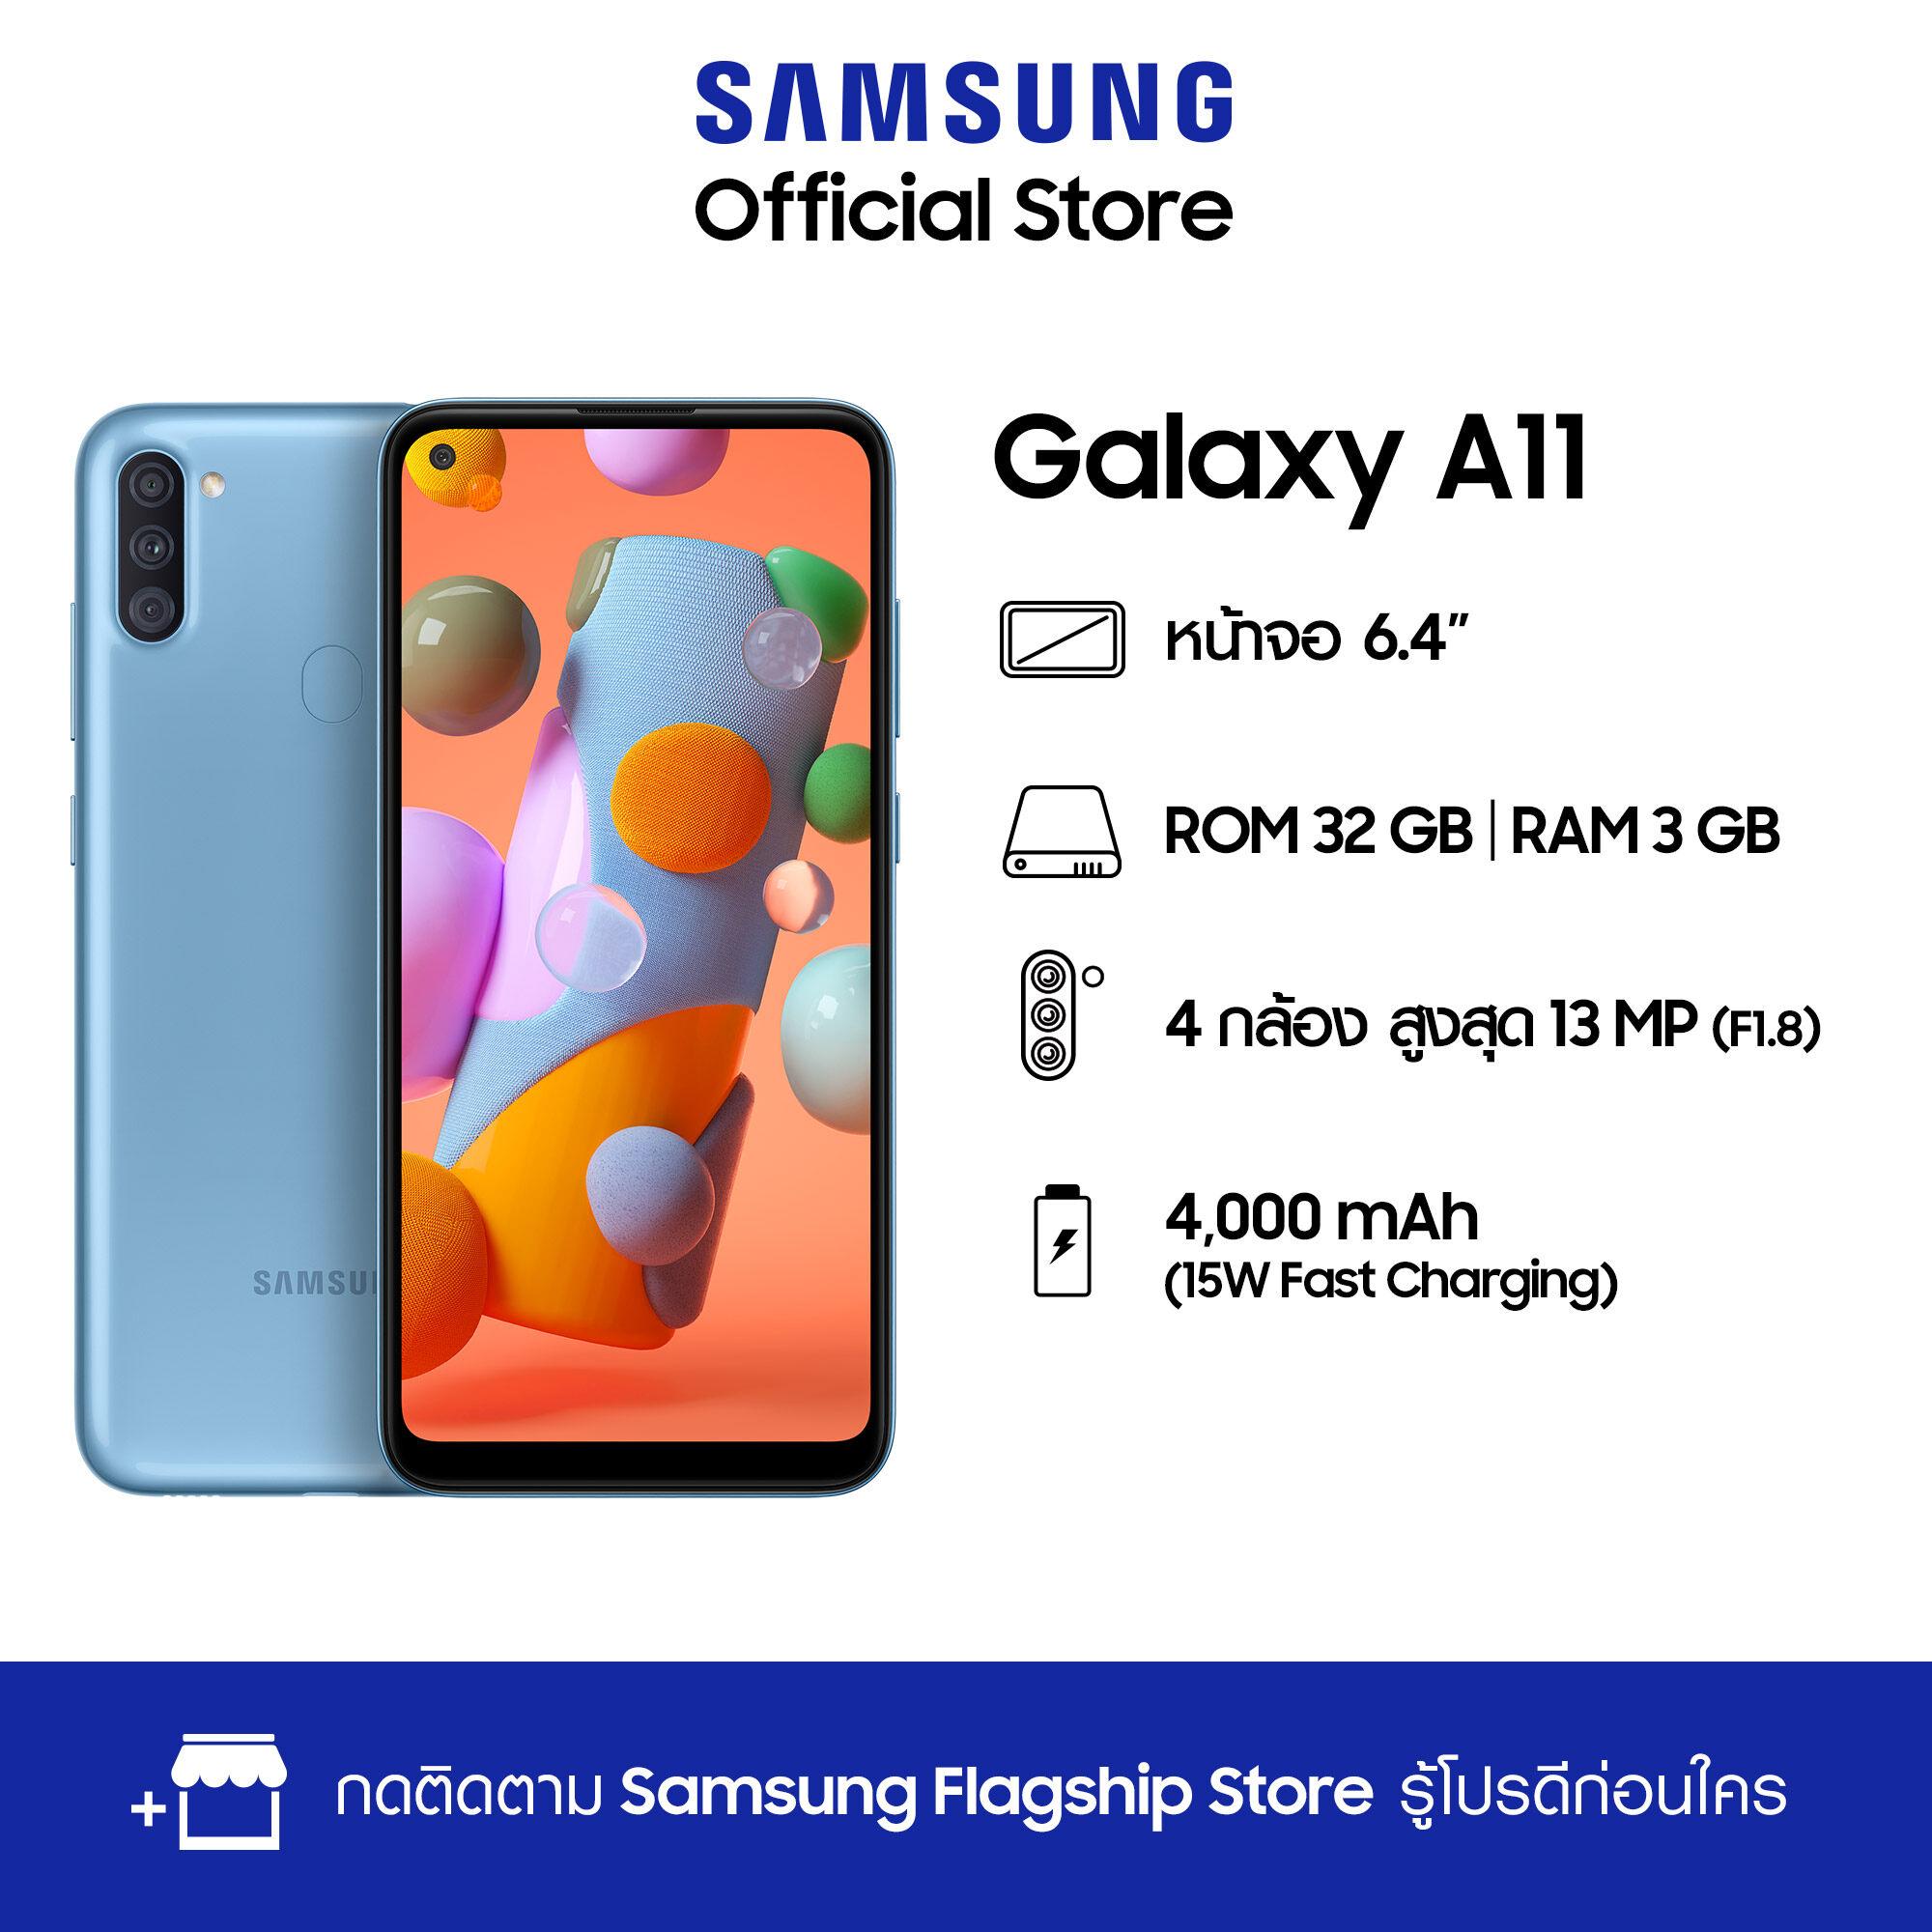 Samsung Galaxy A11 (3/32GB) (โทรศัพท์มือถือ)